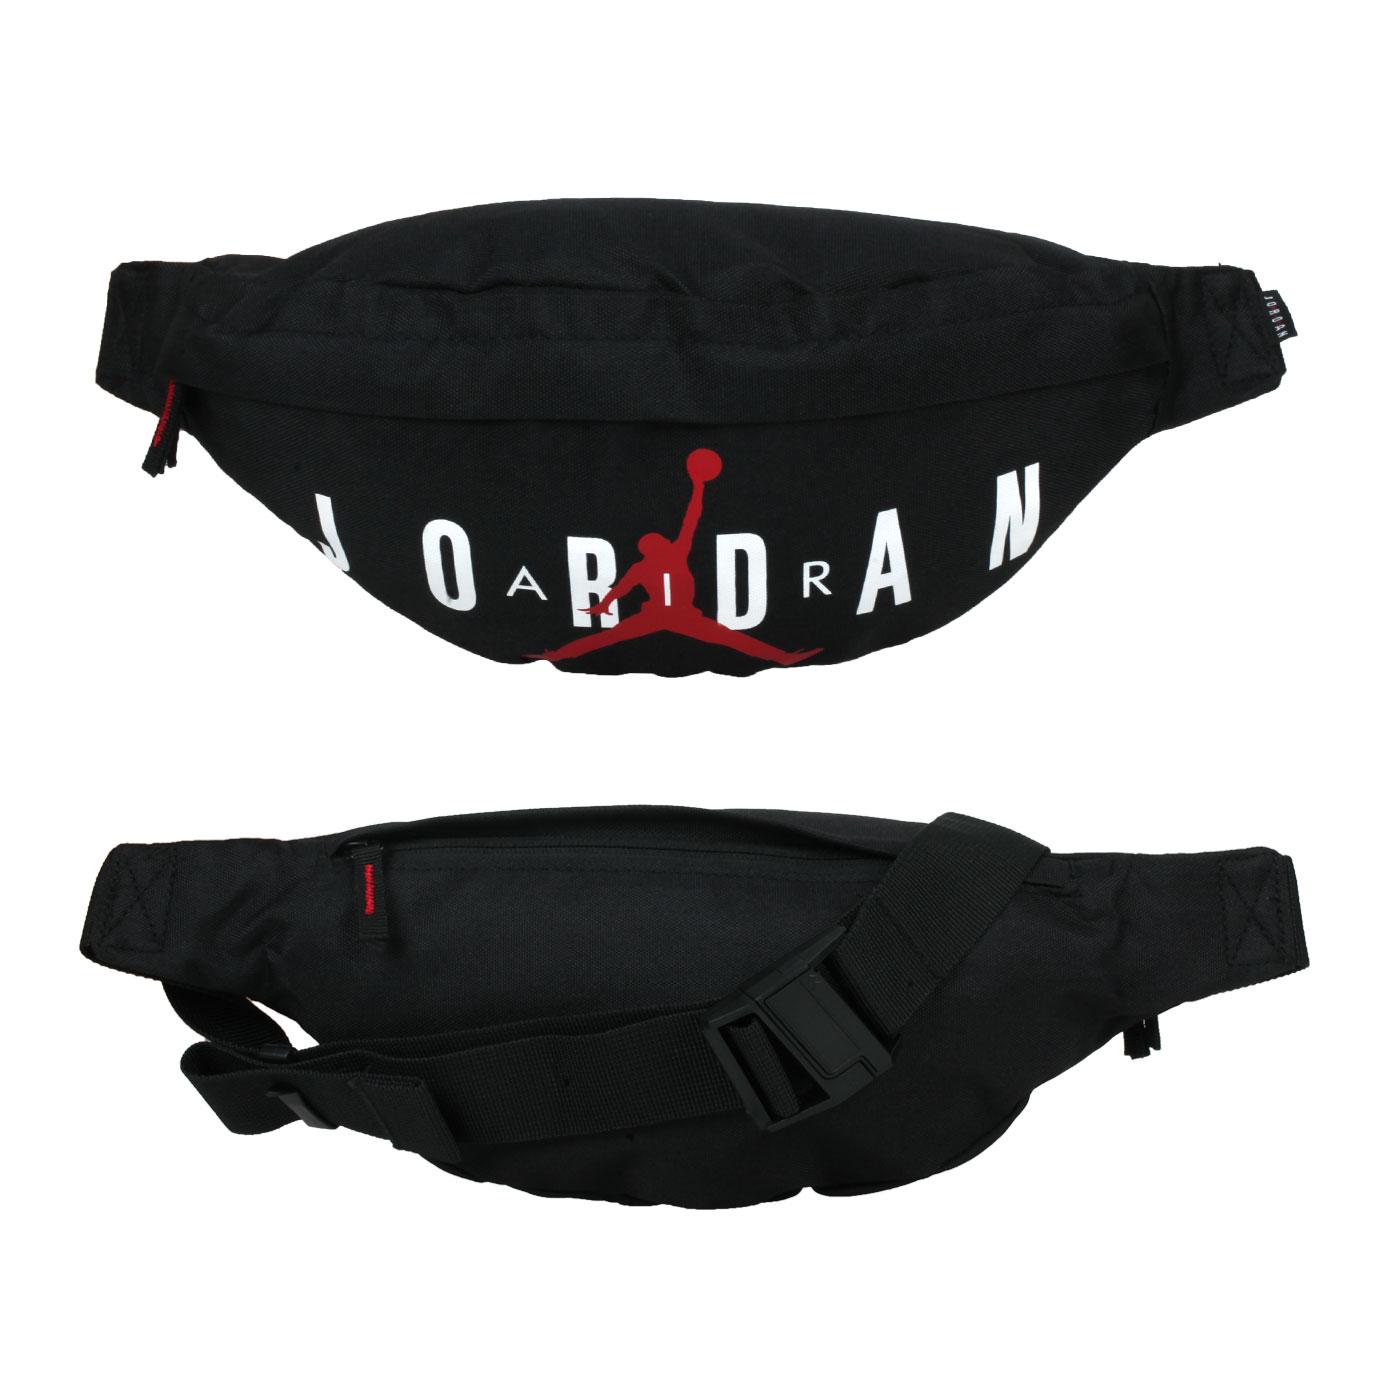 NIKE JORDAN 小型腰包 JD2143011GS-001